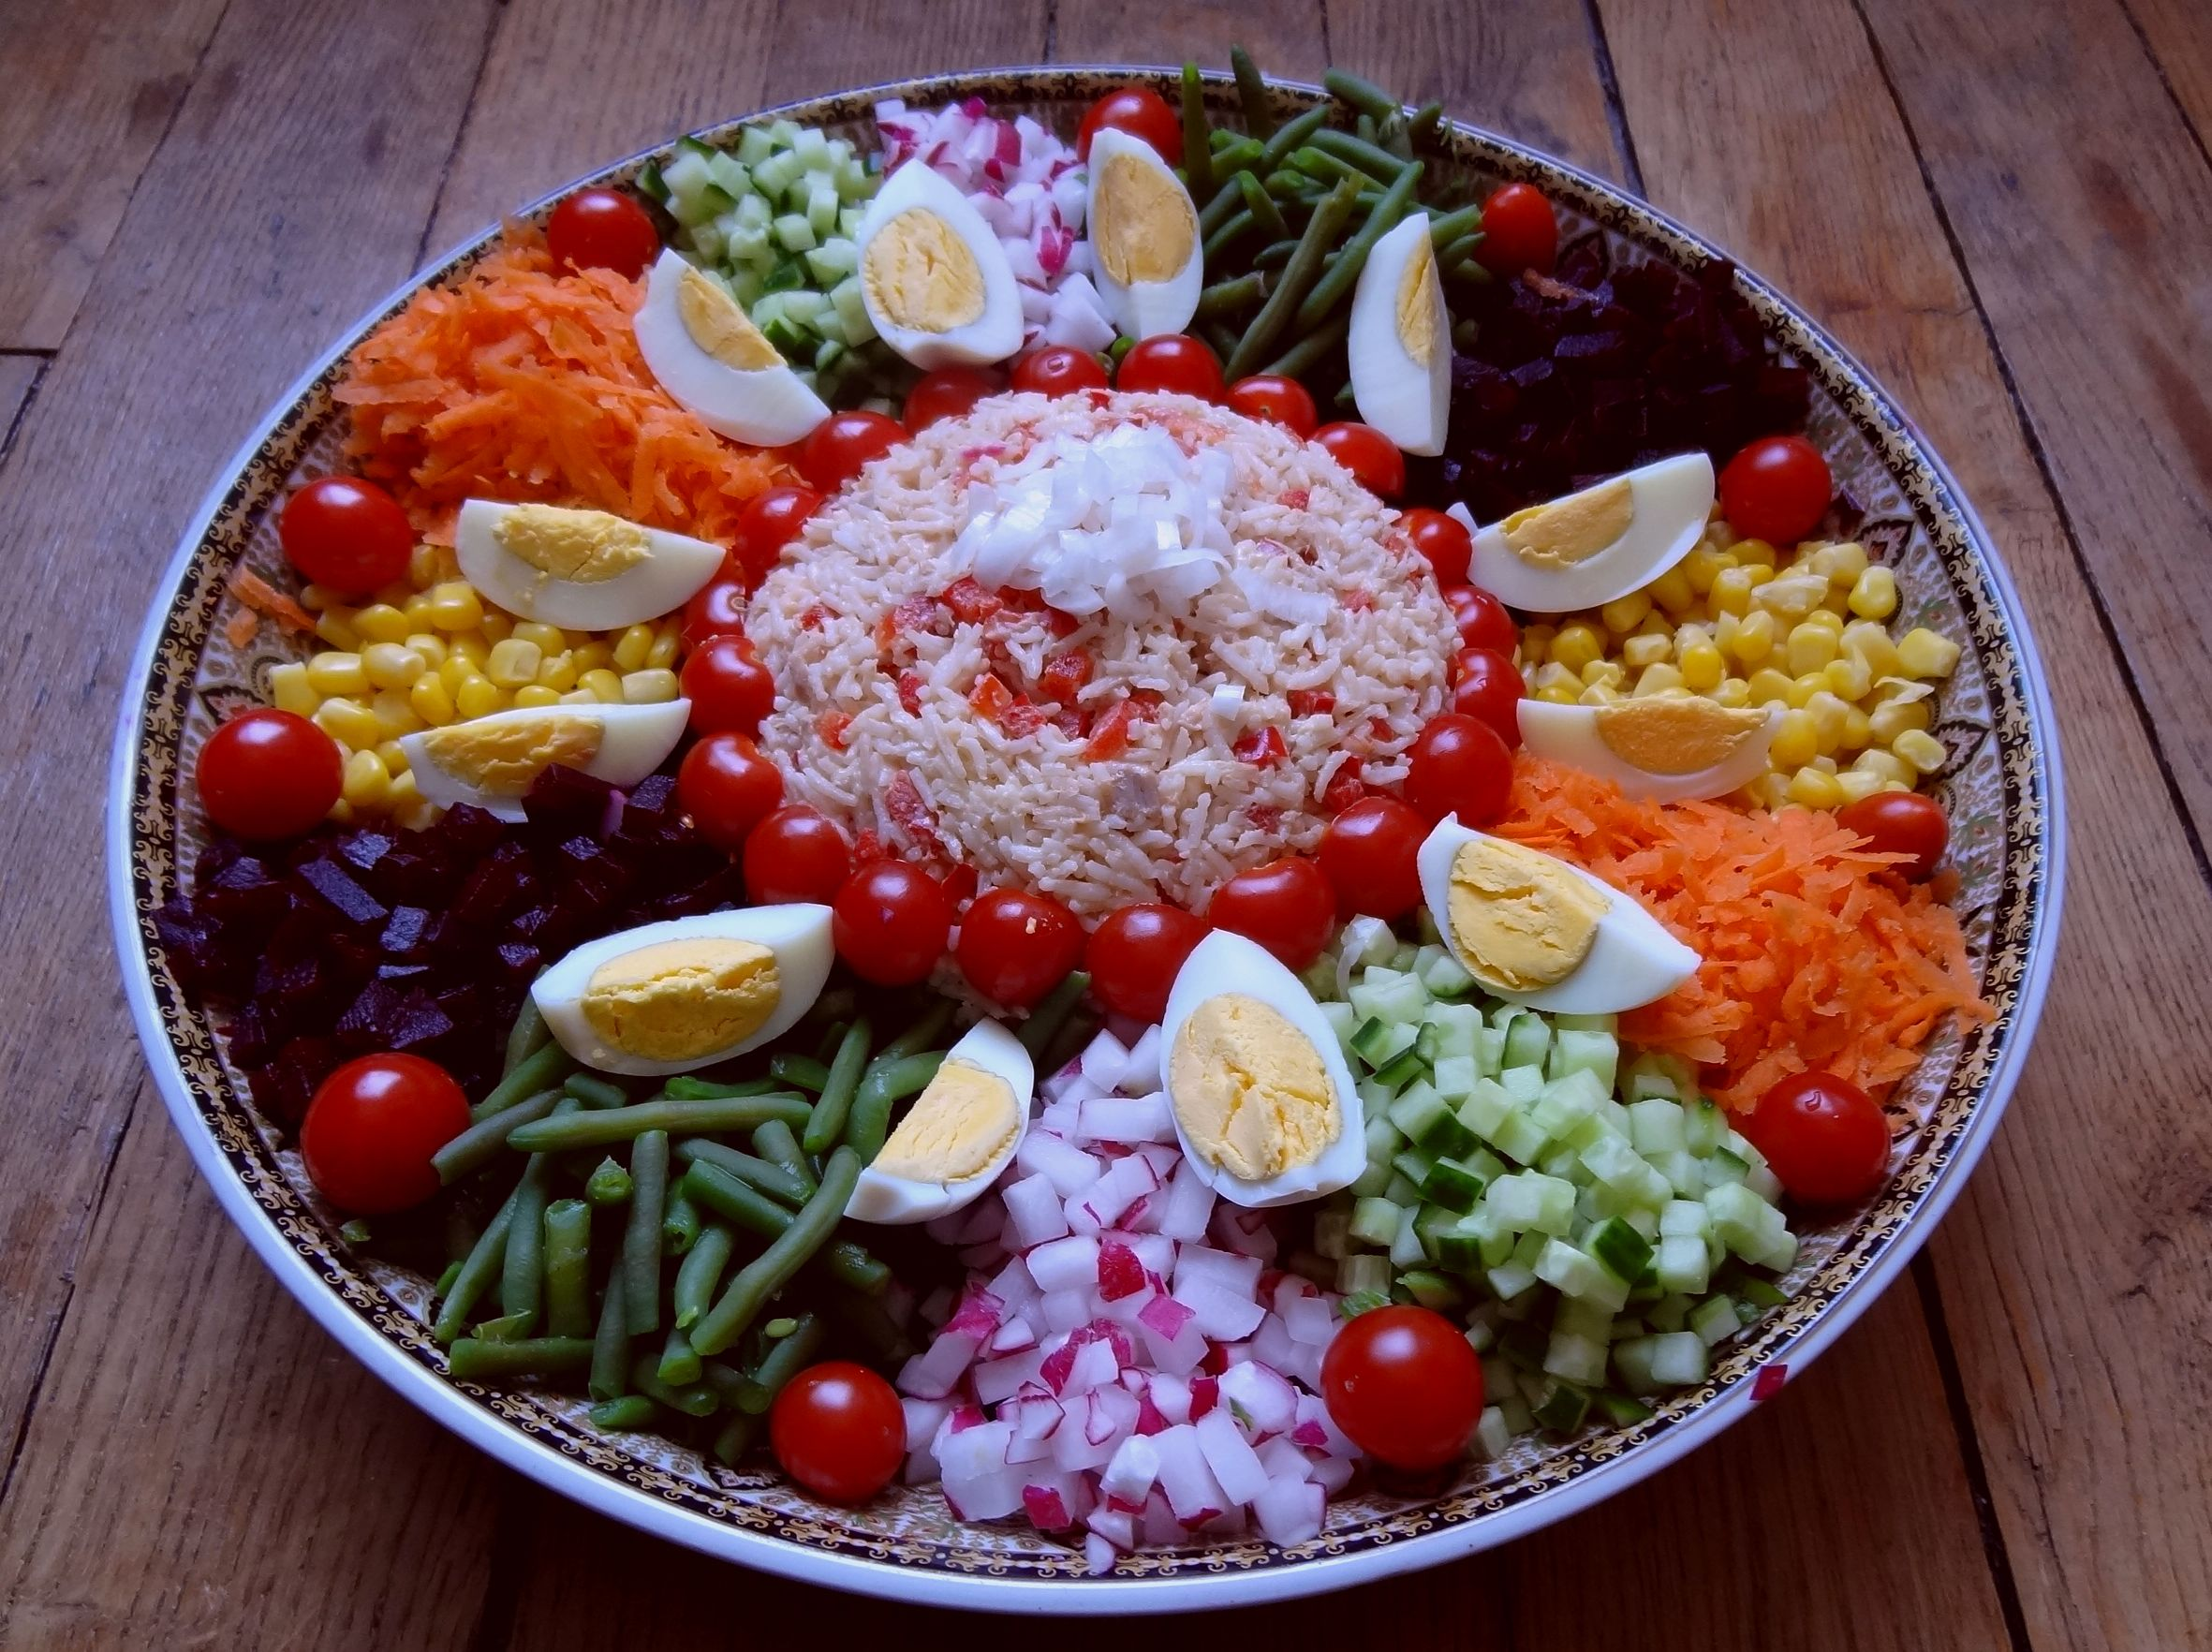 Salade marocaine maroc la tendresse en cuisine for Entrees faciles froides